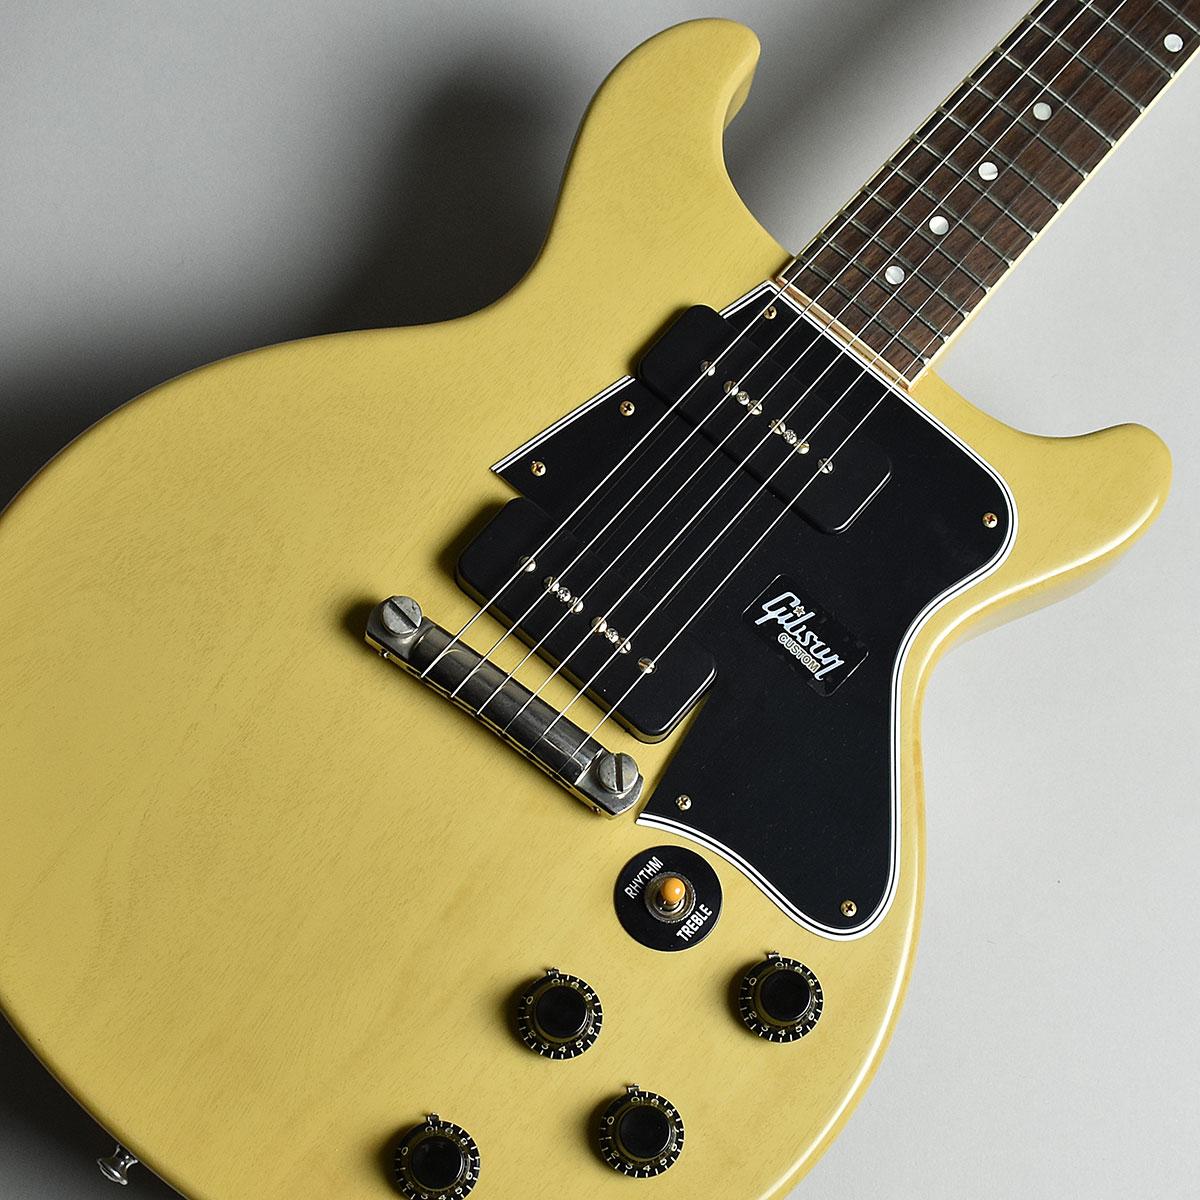 Gibson Custom Shop 1960 Les Paul Special Double Cut VOS TV Yellow S/N:08696 レスポールスペシャル 【ギブソン カスタムショップ】【未展示品】